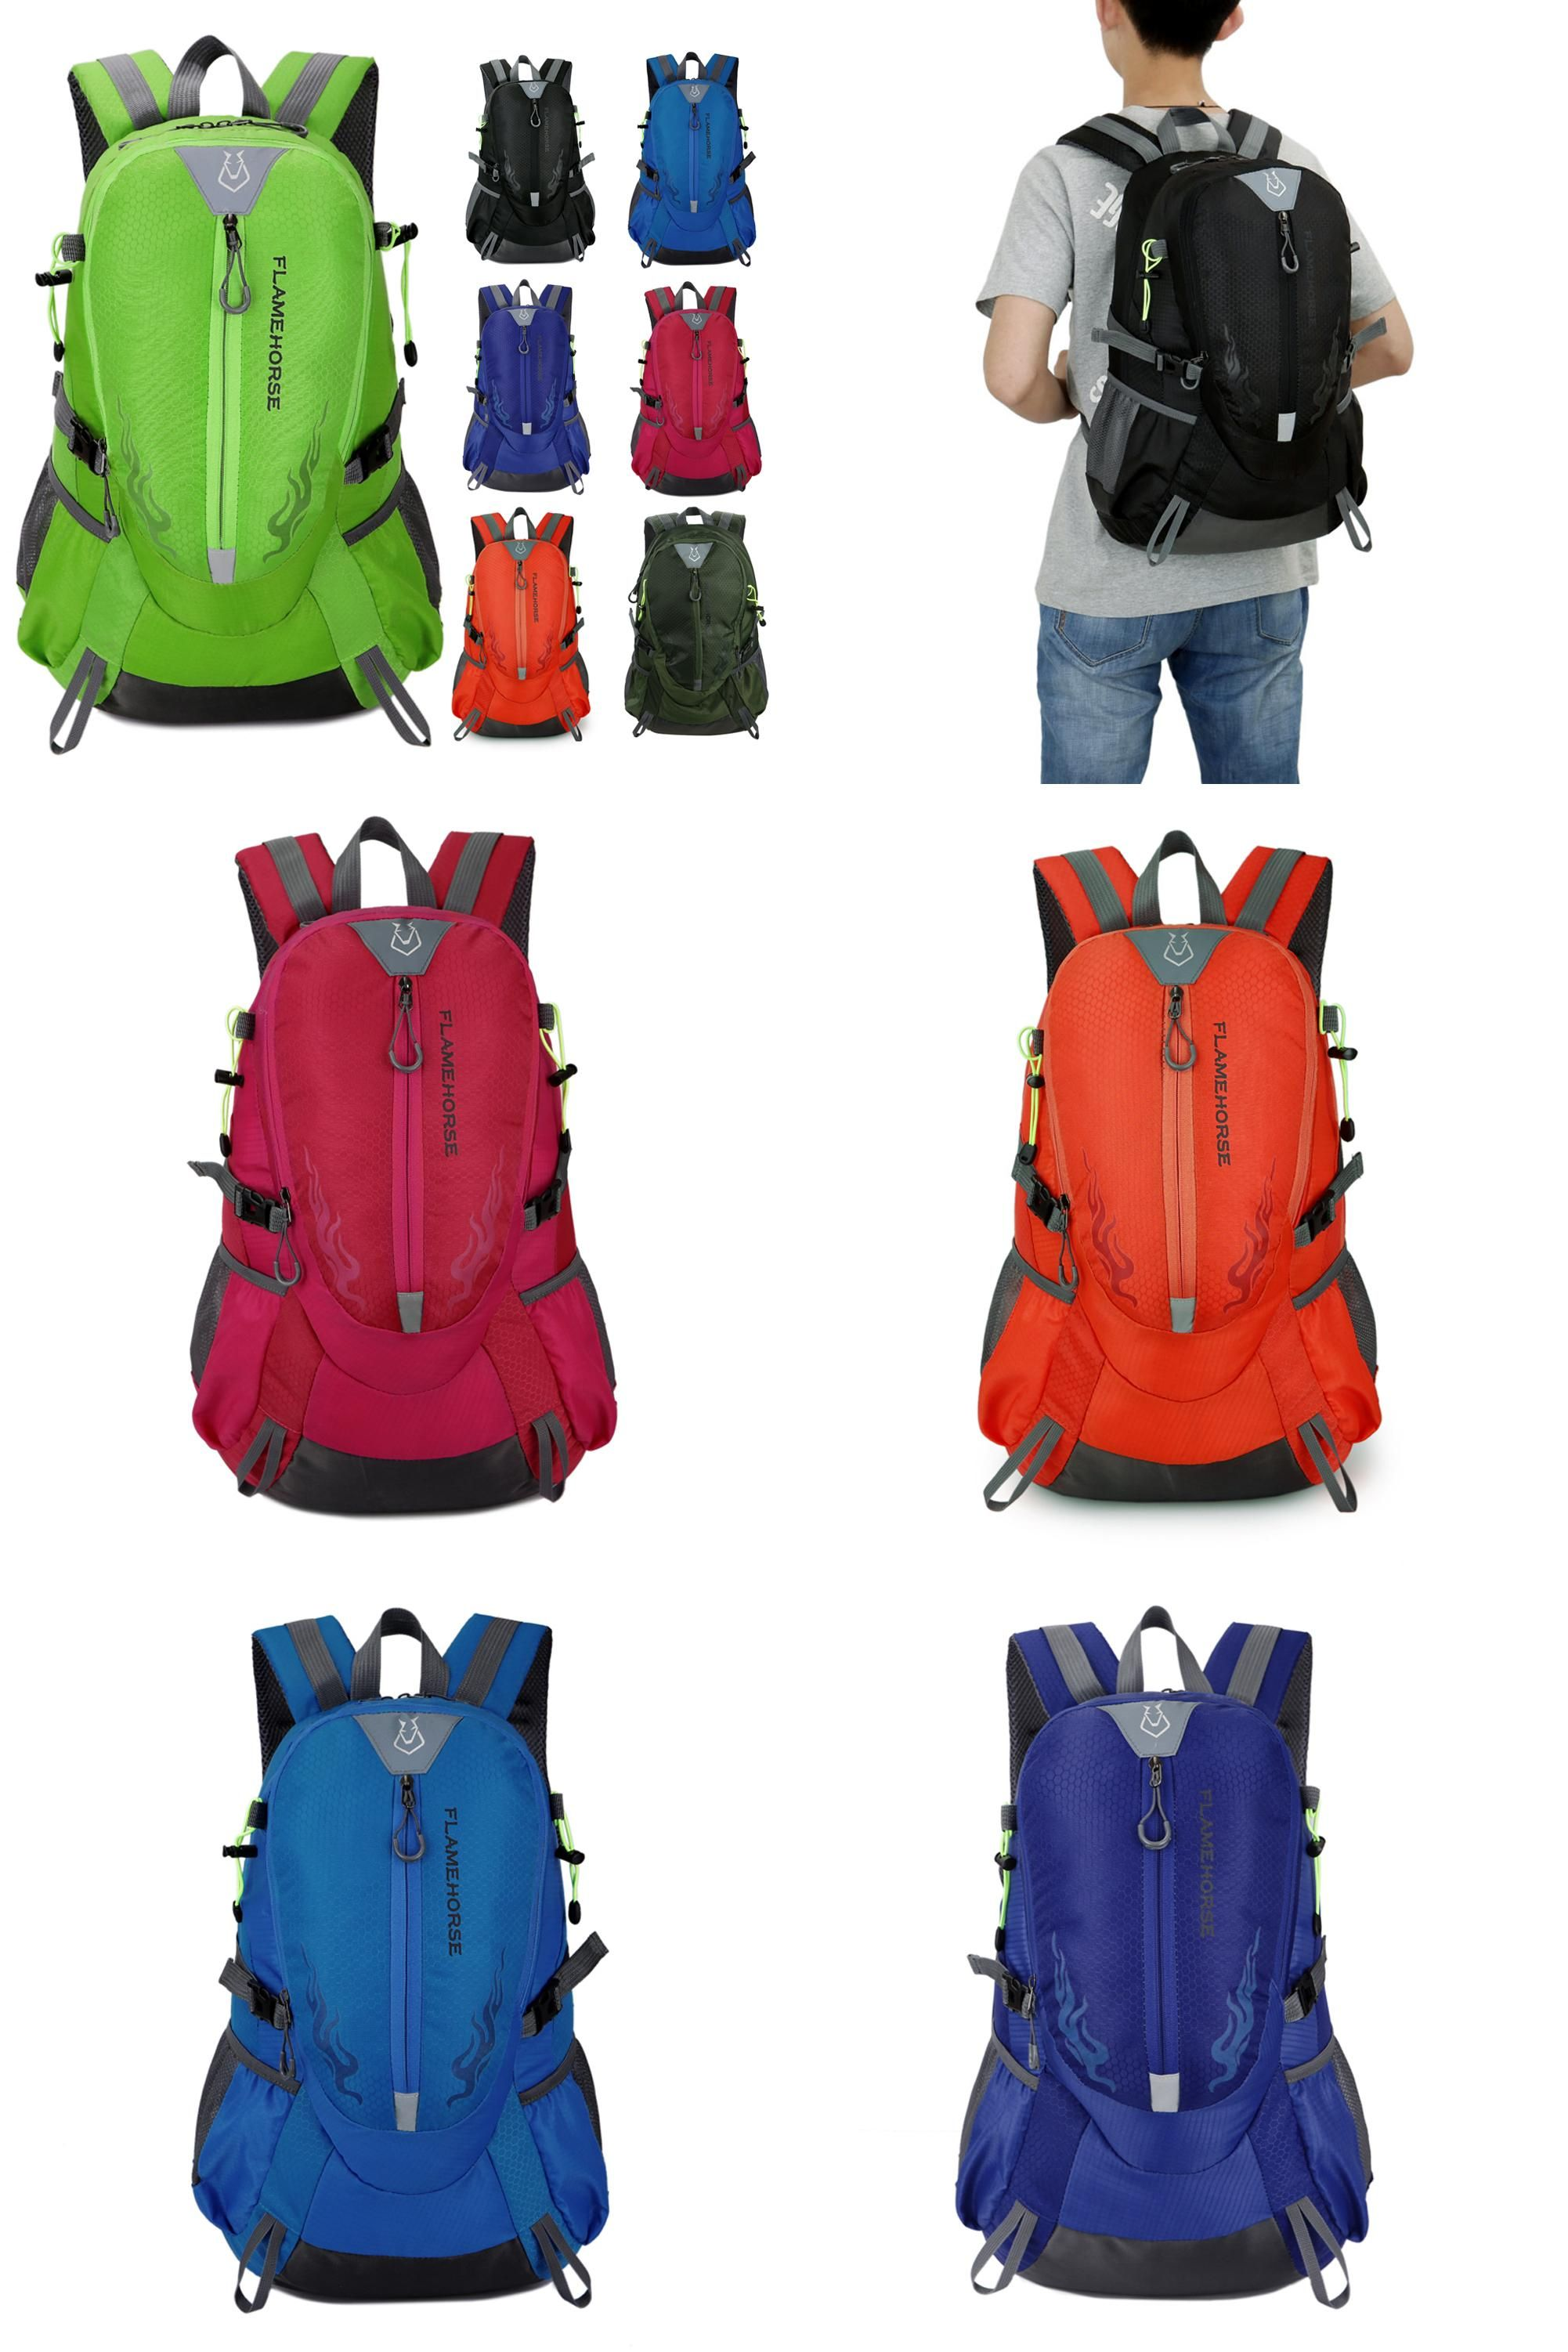 8b506bdfdd  Visit to Buy  Flame Horse Outdoor Hiking Bag Waterproof Nylon Women   Men  Big